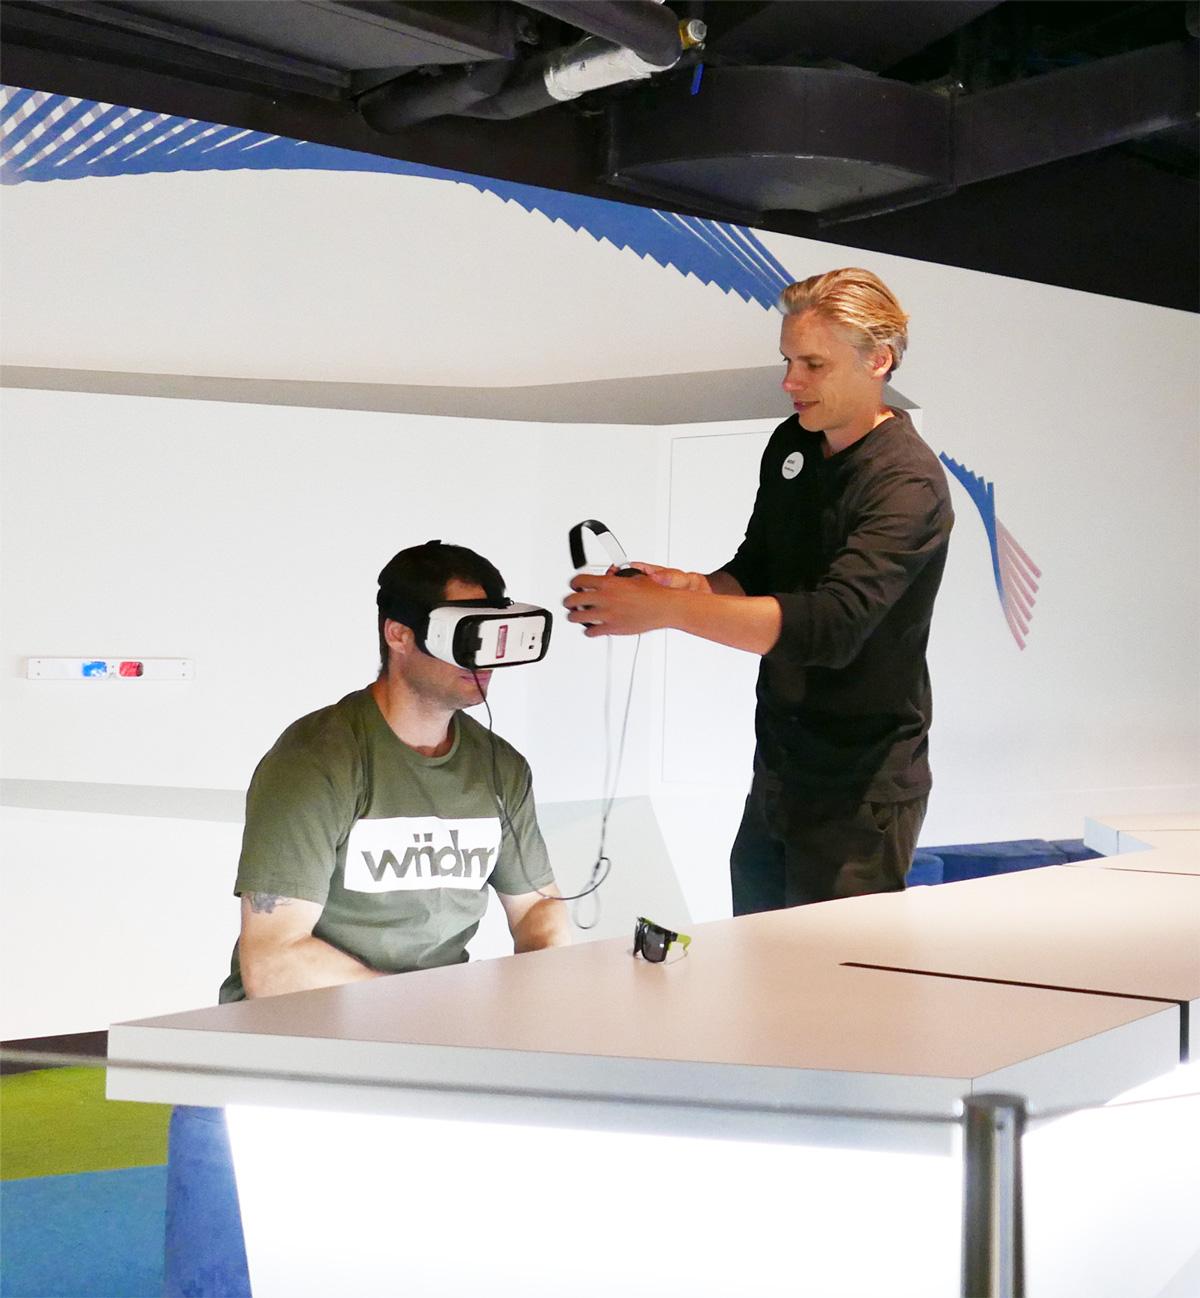 Fed-Sqr-ACMI-VR.jpg